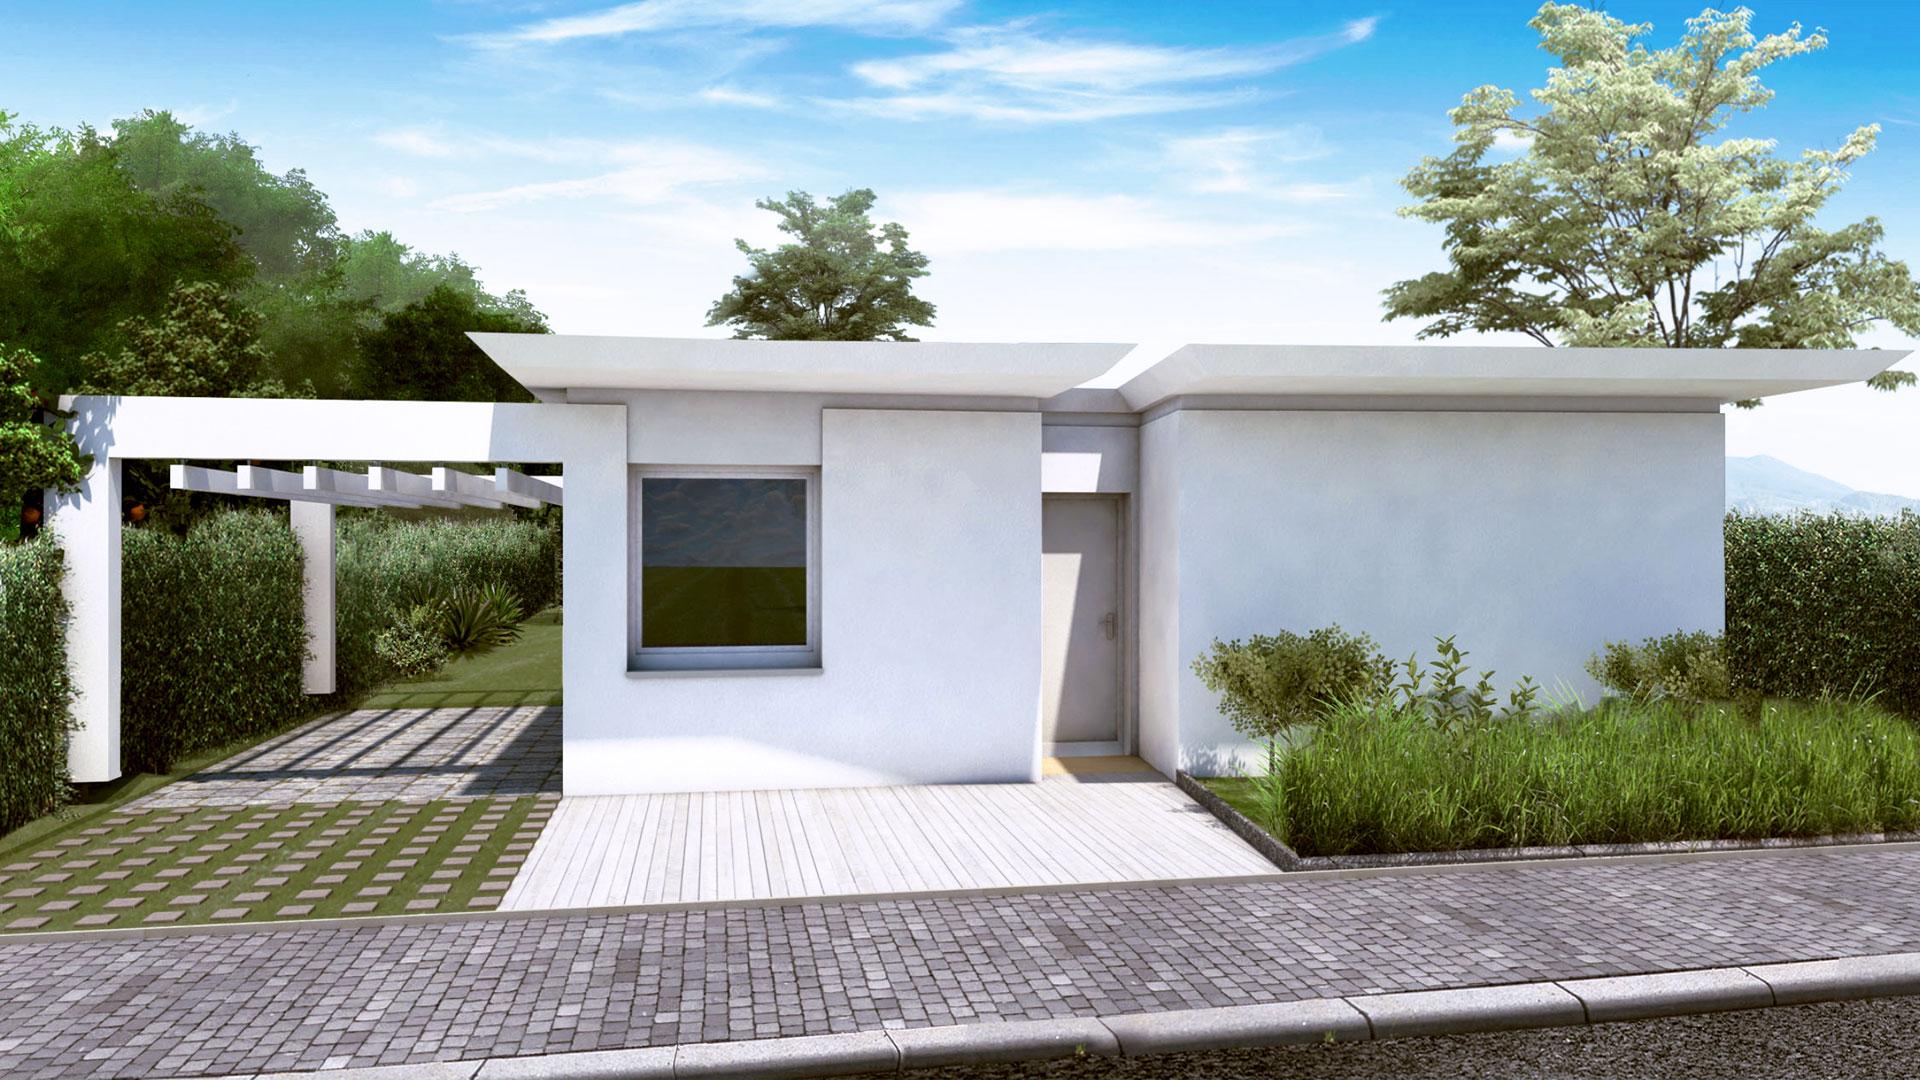 Haus Trapez Front